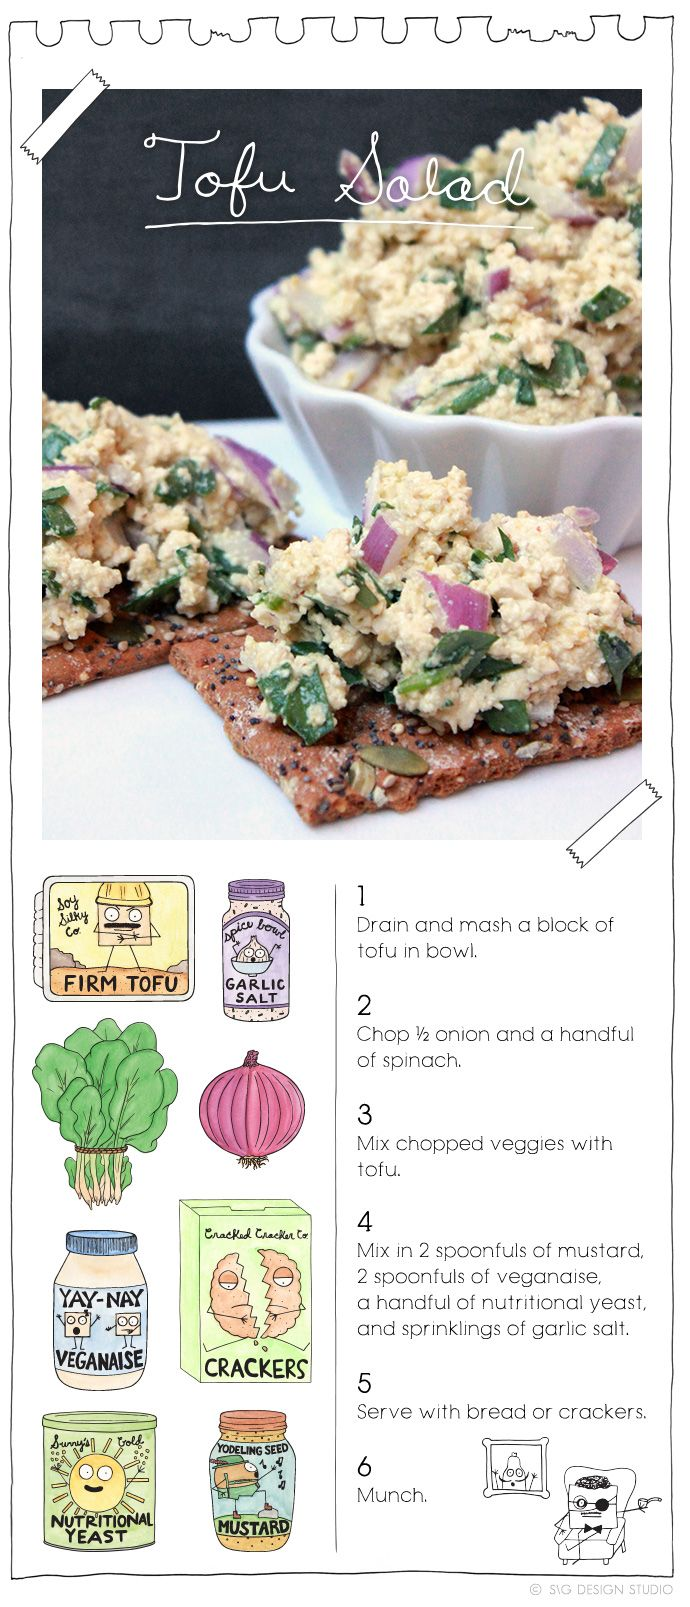 Tofu Salad. More recipes at: TheVeganStoner.com